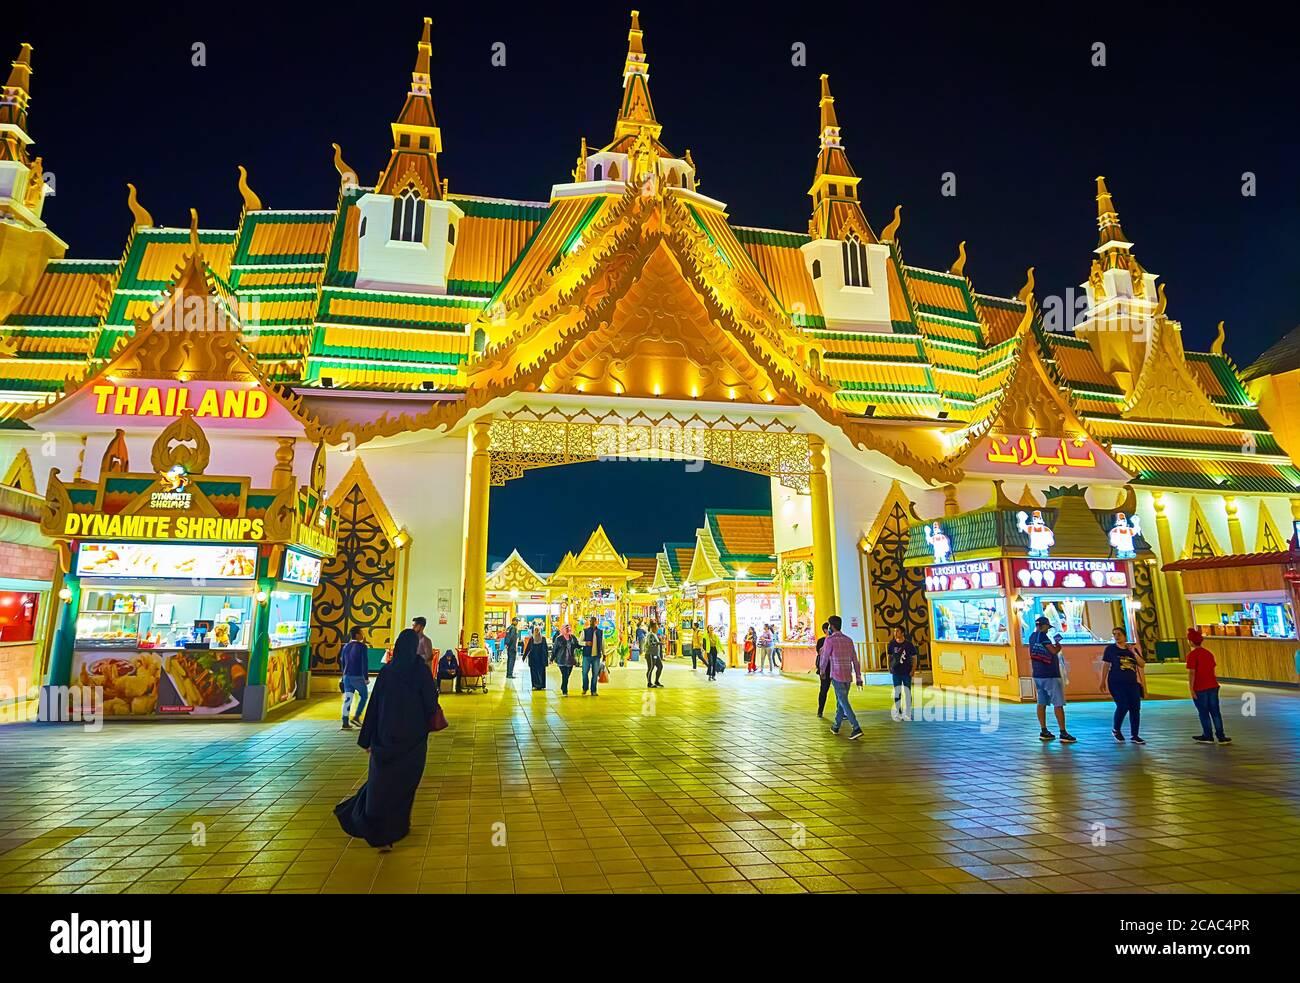 DUBAI, EAU - 5 DE MARZO de 2020: La fachada de Tailandia pabellones de la aldea Global de Dubai con techo tradicional de pithat (multitired), coronado con remolque de chedi Foto de stock